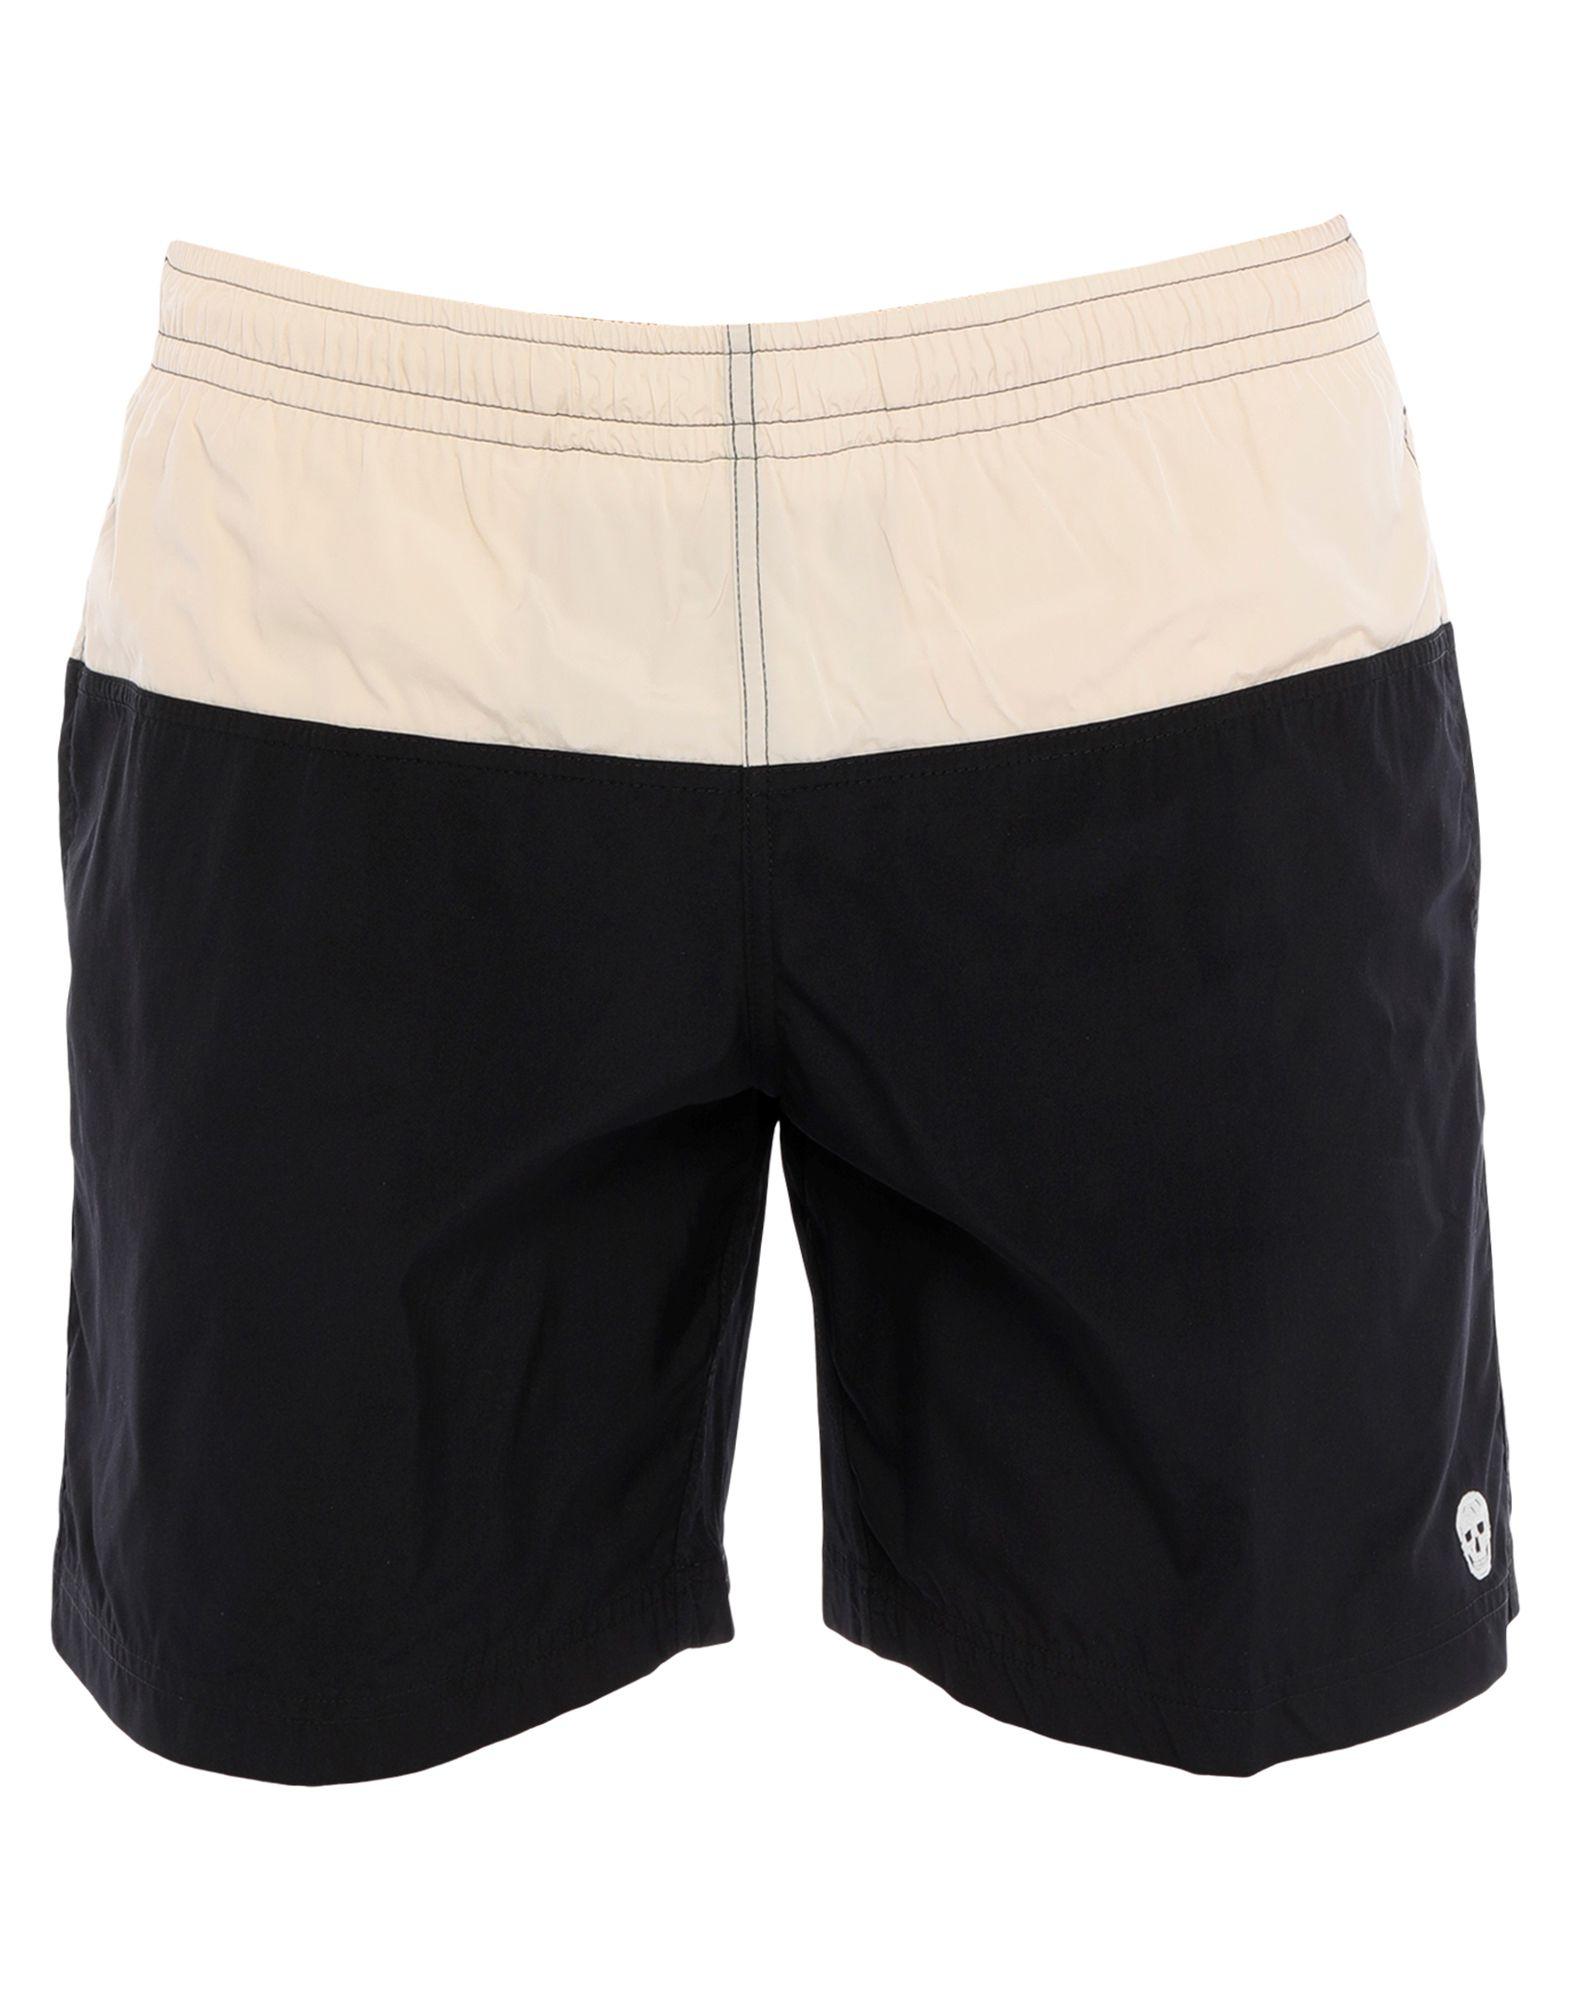 ALEXANDER MCQUEEN Swim trunks. techno fabric, logo, laces, two-tone, no fastening, multipockets, elasticized waist, internal slip. 100% Polyamide, Polyester